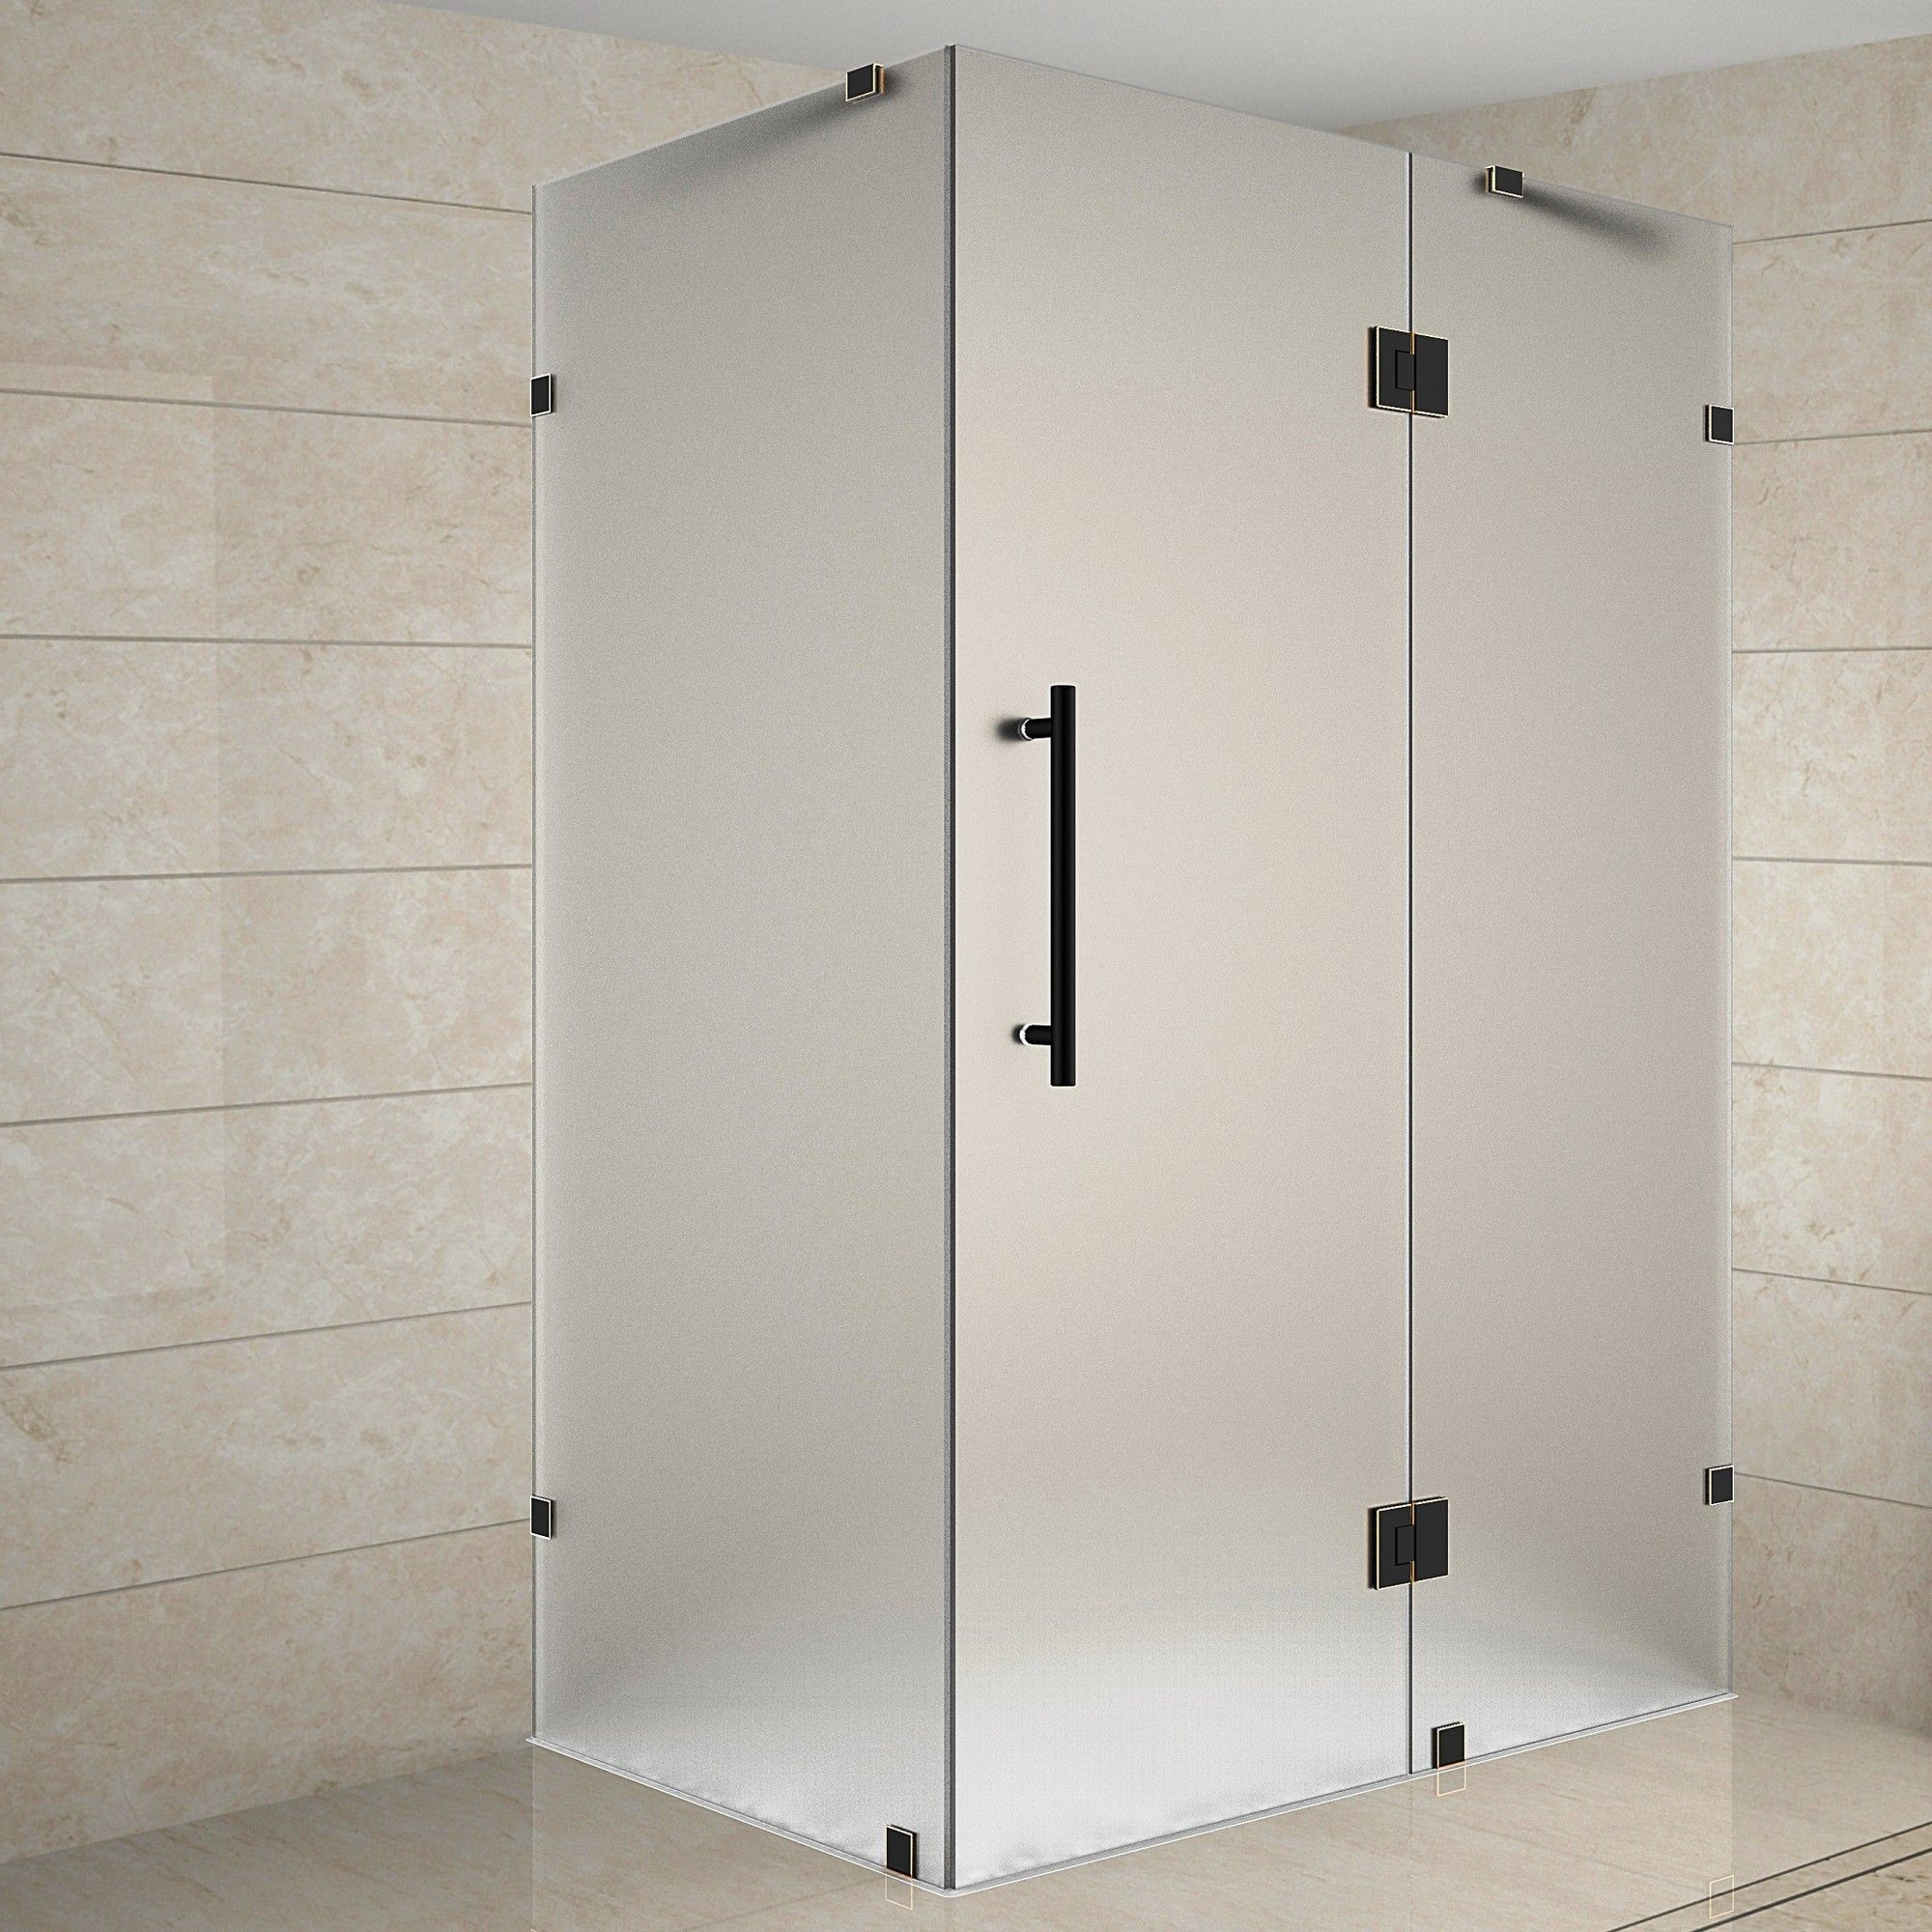 Avalux 39 X 72 Rectangle Hinged Shower Enclosure Frameless